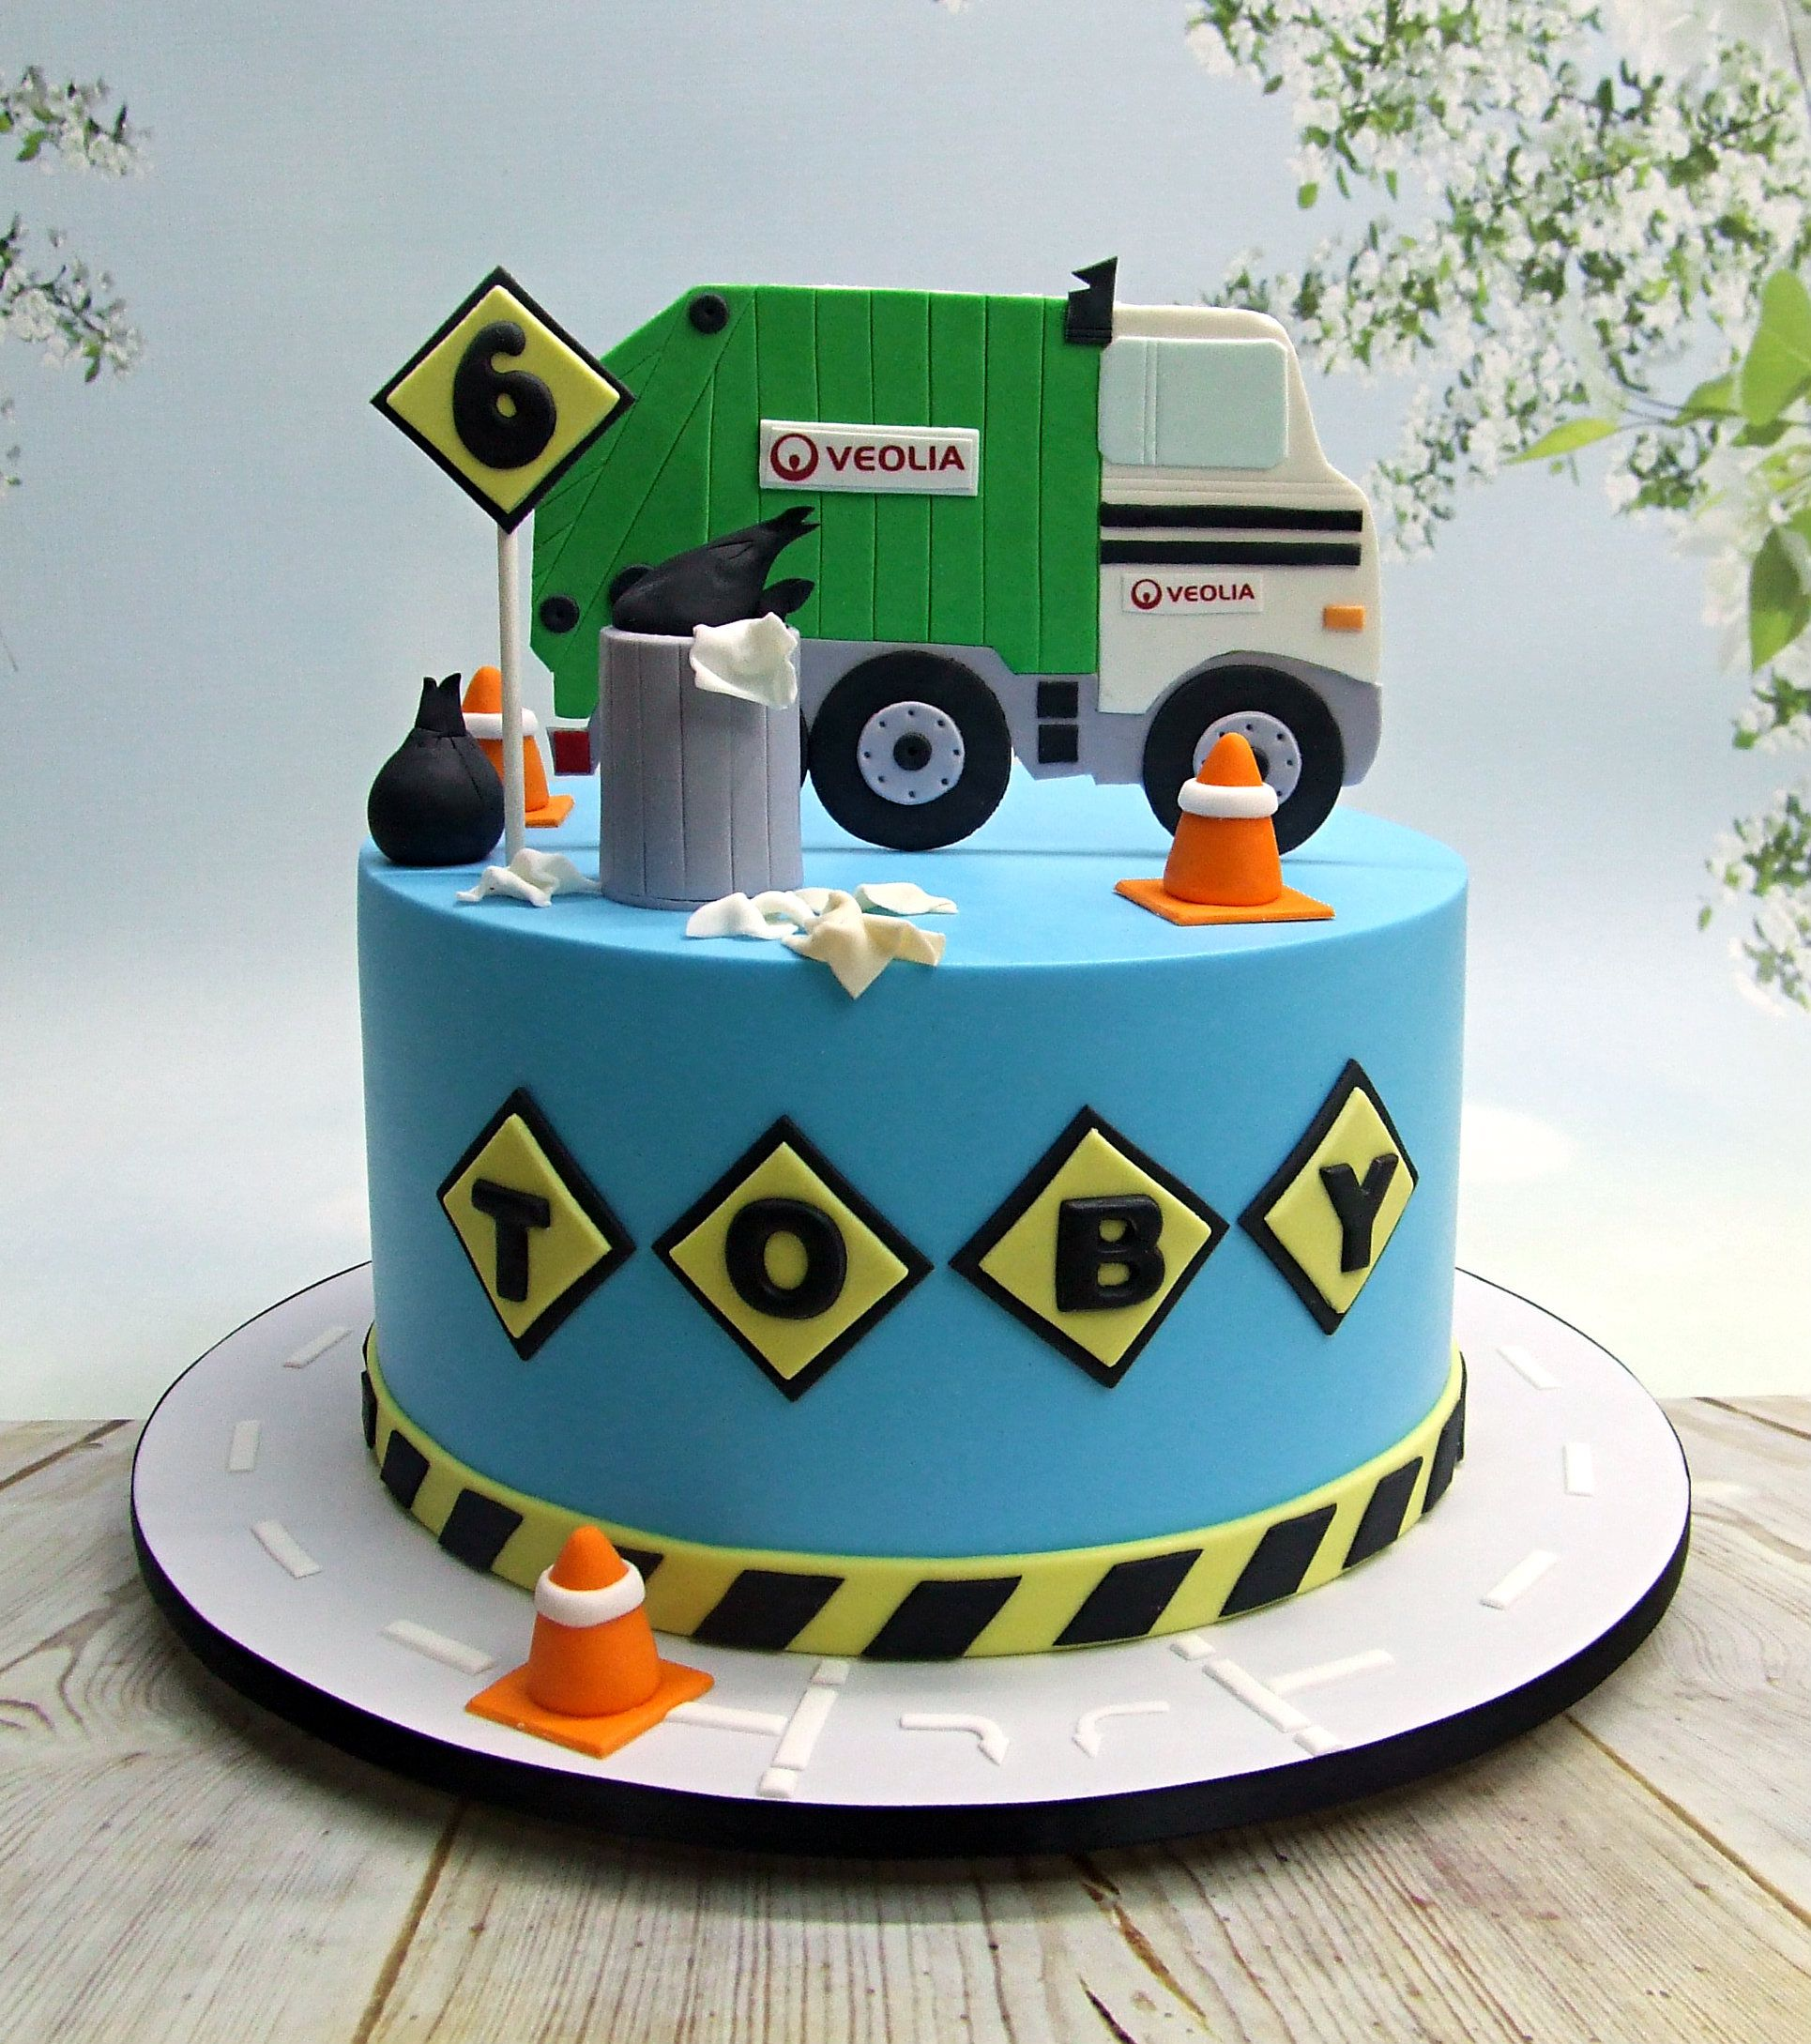 Astonishing Garbage Truck Cake With Images Truck Birthday Cakes Truck Personalised Birthday Cards Veneteletsinfo